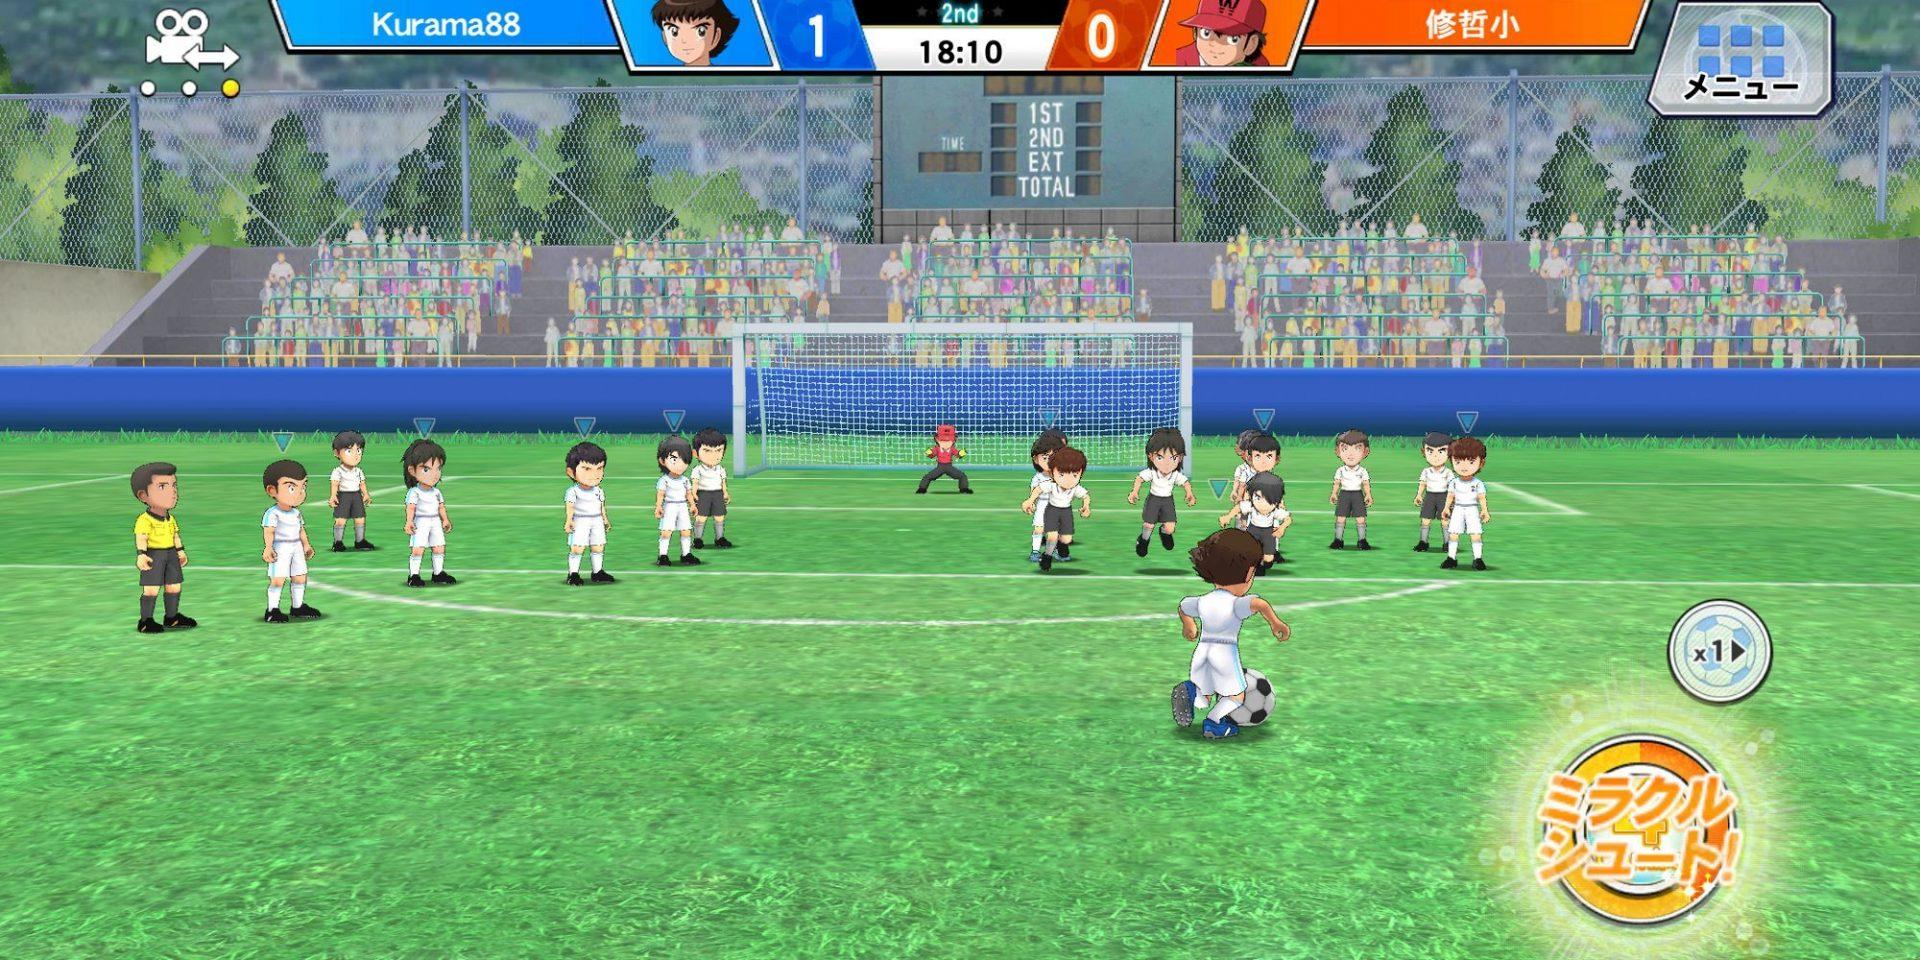 Captain Tsubasa Zero ~Kimero! Miracle Shot~